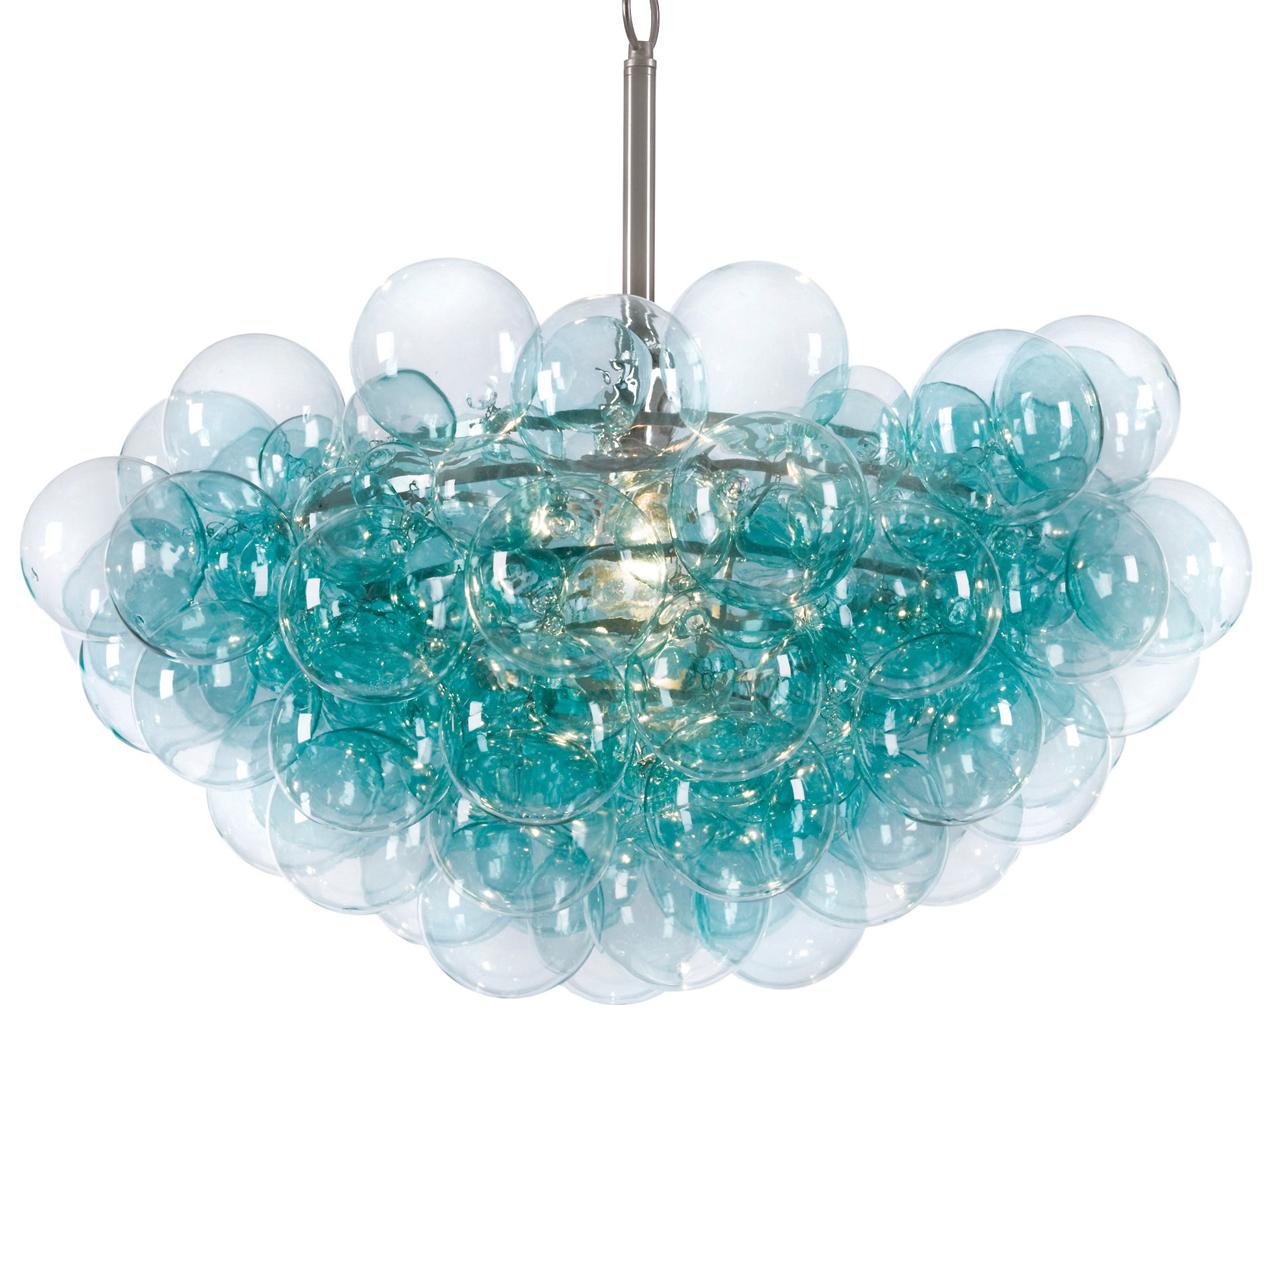 Sima Modern Floating Glass Bubbles Aqua Chandelier